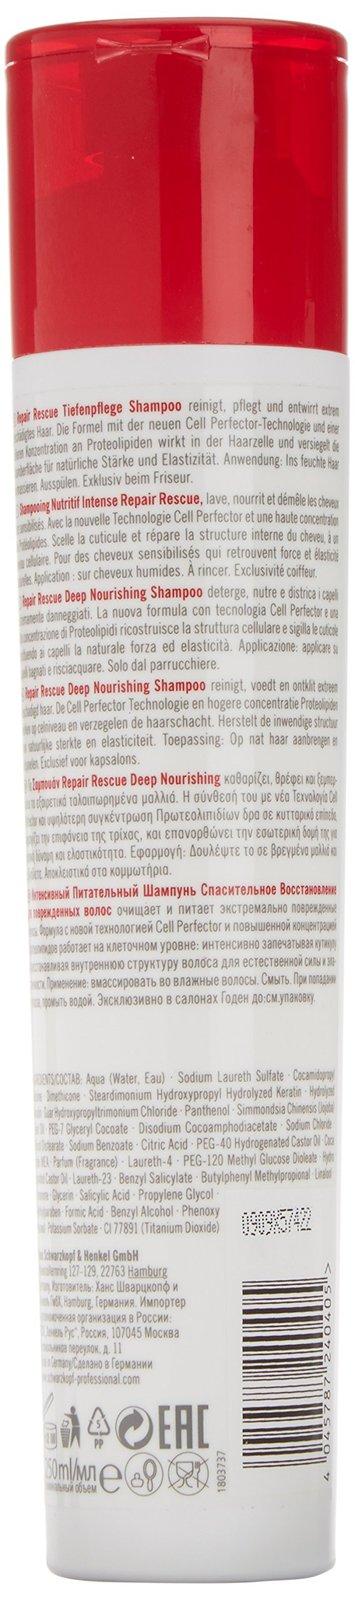 Schwarzkopf BC Repair Rescue Deep Nourishing Shampoo (For Damaged Hair) 250ml